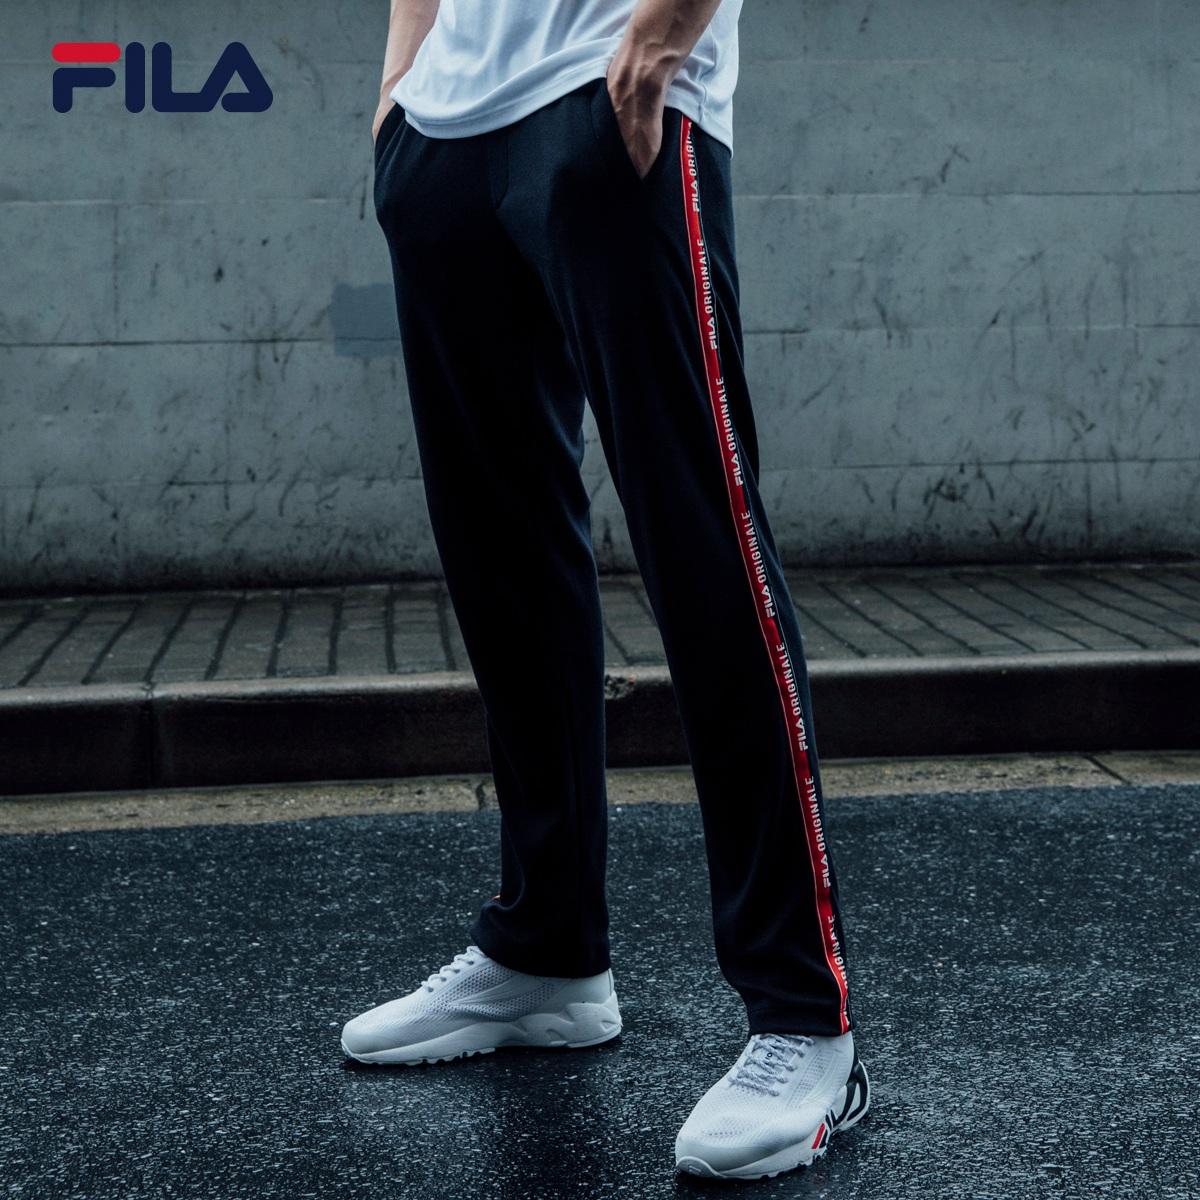 f85fea92dc47 FILA Fila men's trousers 2018 spring new trousers casual fashion running  pants men